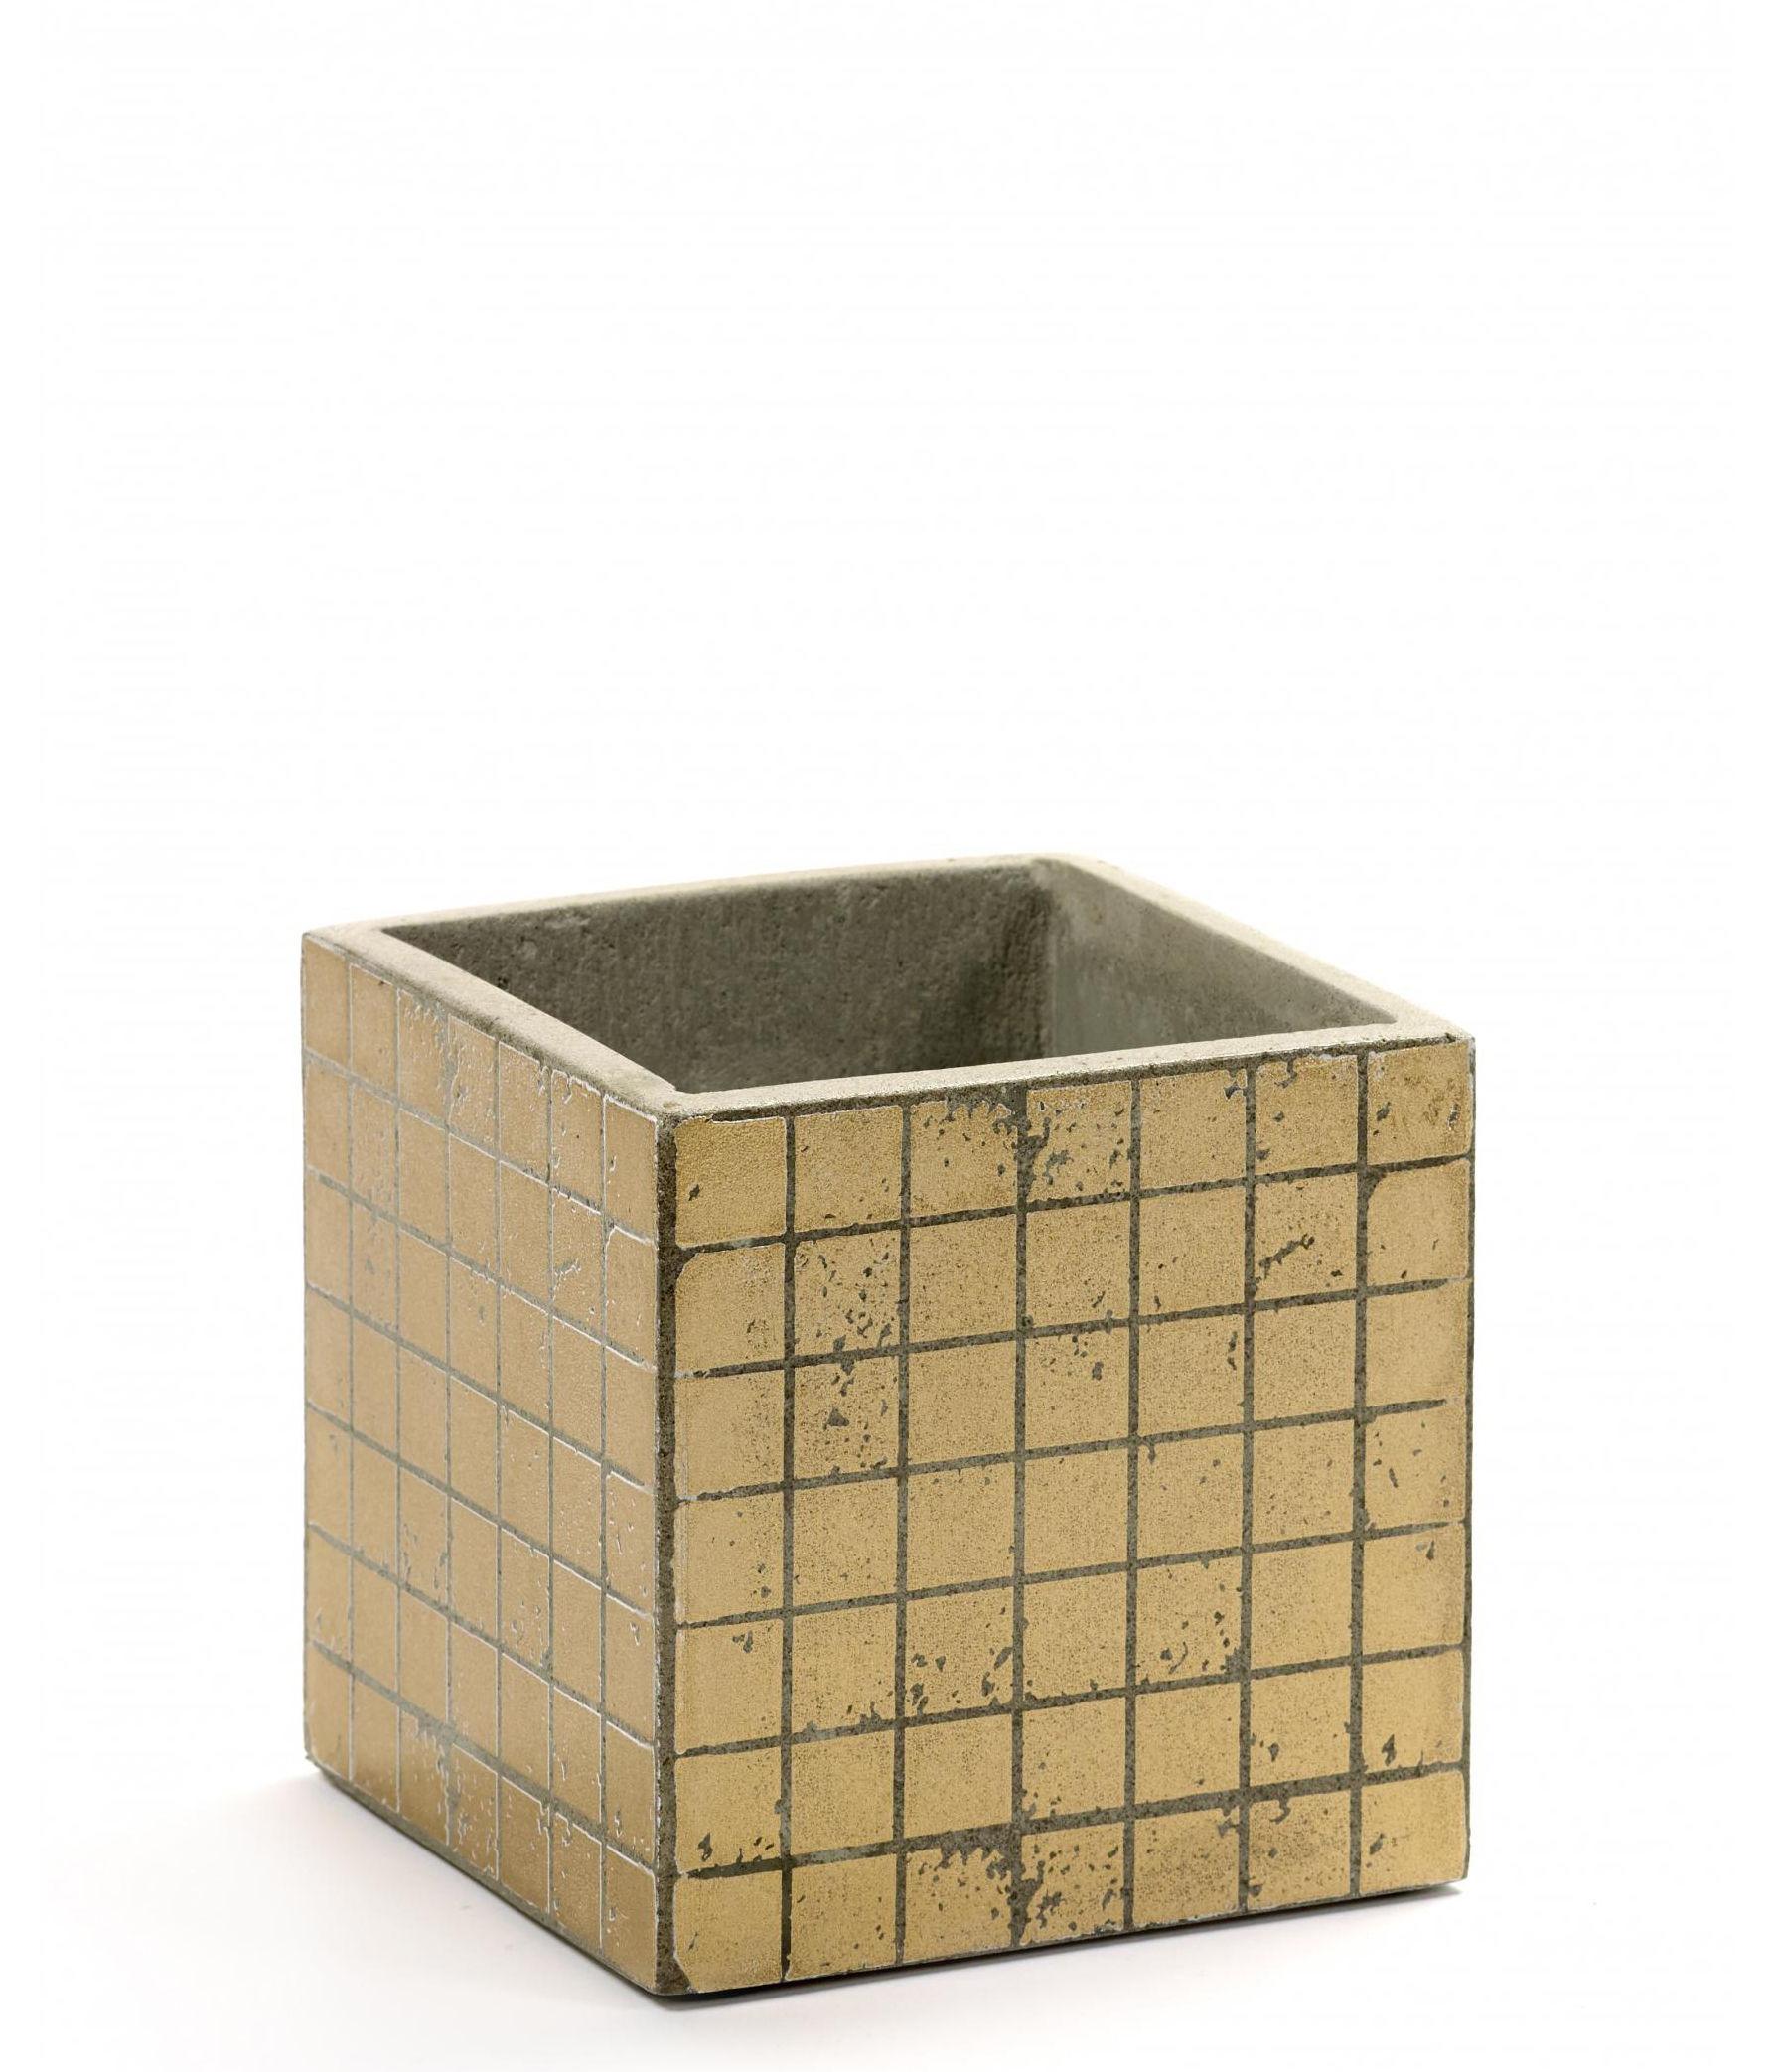 Outdoor - Töpfe und Pflanzen - Marie Mosaïque Topf / 13 x 13 cm - emaillierter Beton - Serax - Goldfarben - Béton émaillé